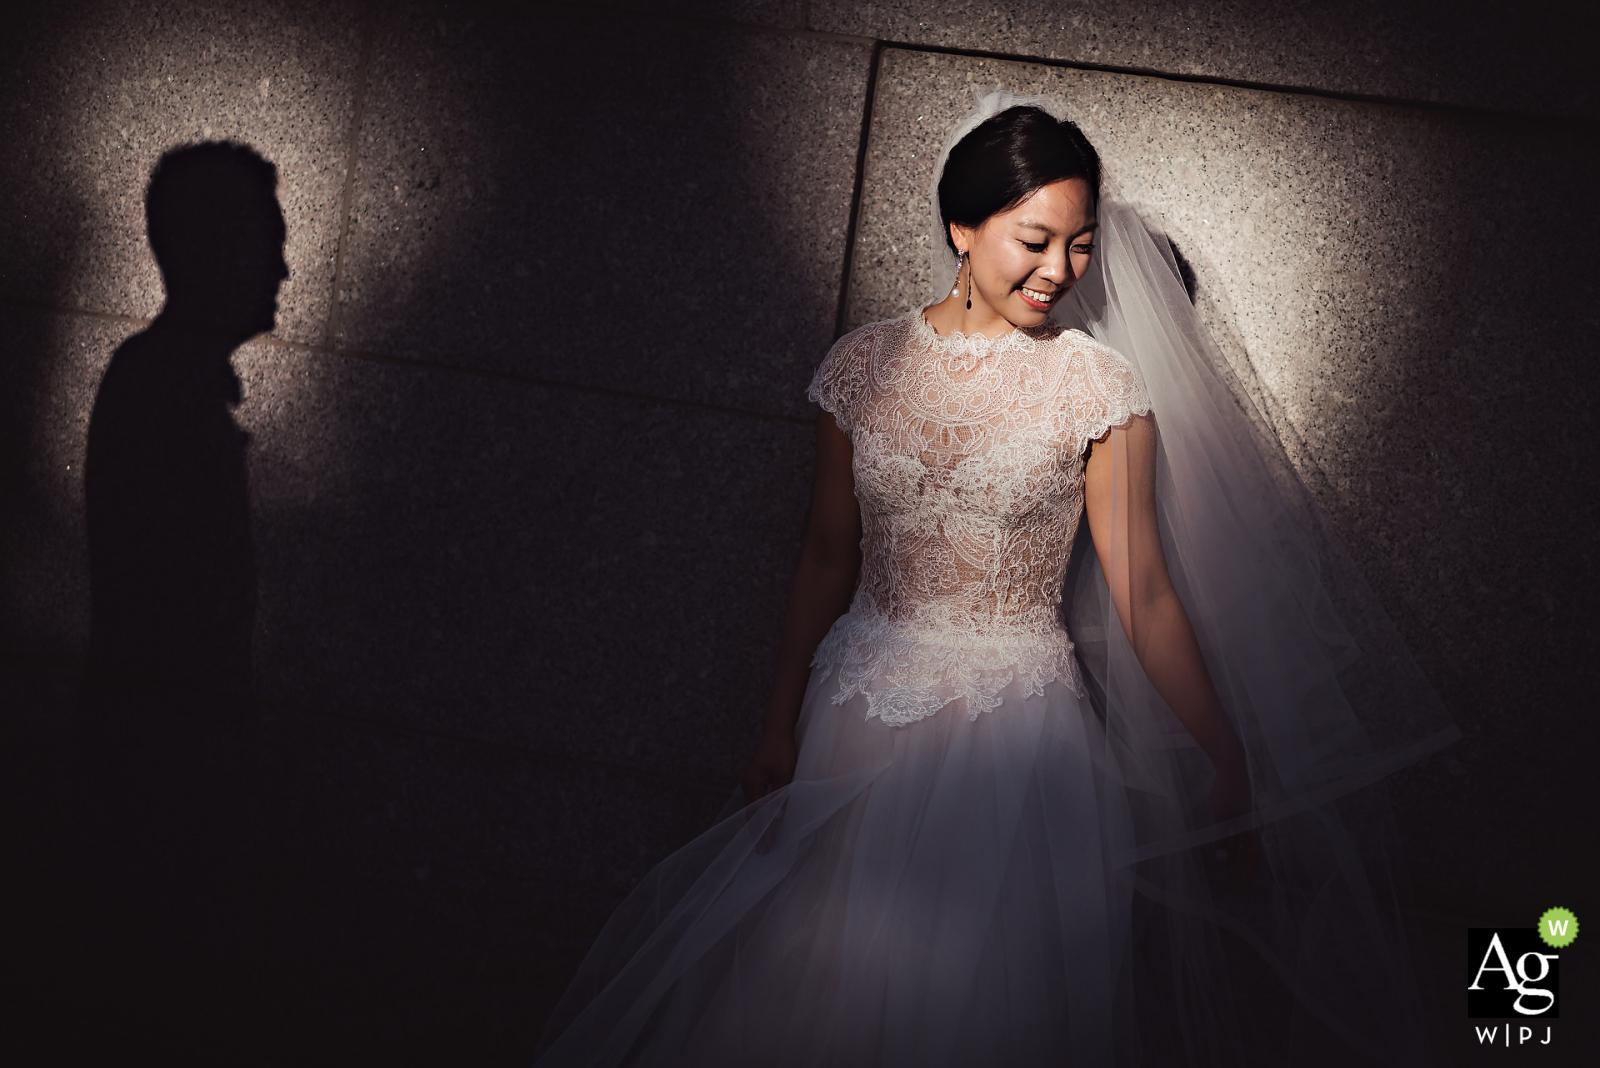 Tim D. Yun is an artistic wedding photographer for New York